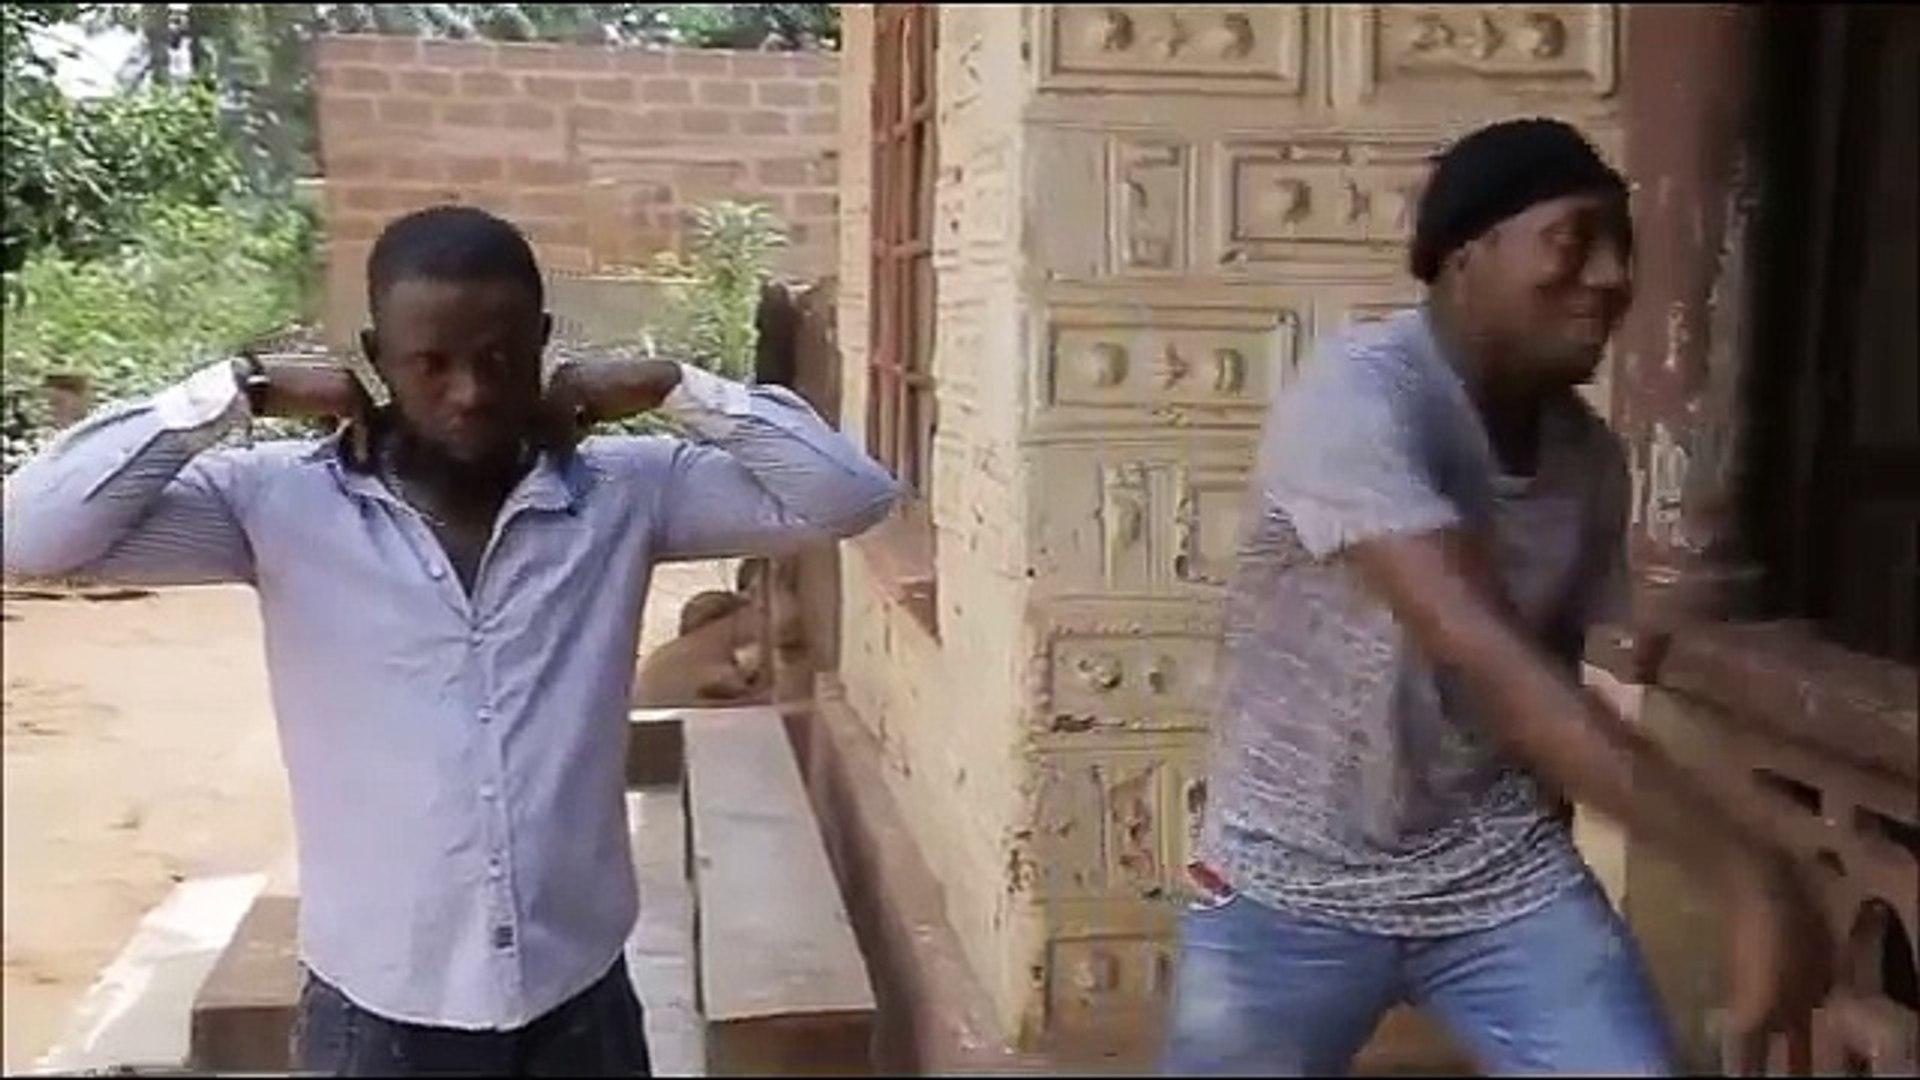 VILLAGE DAMSEL || 2017 LATEST NIGERIAN MOVIES || LATEST NIGERIAN MOVIES